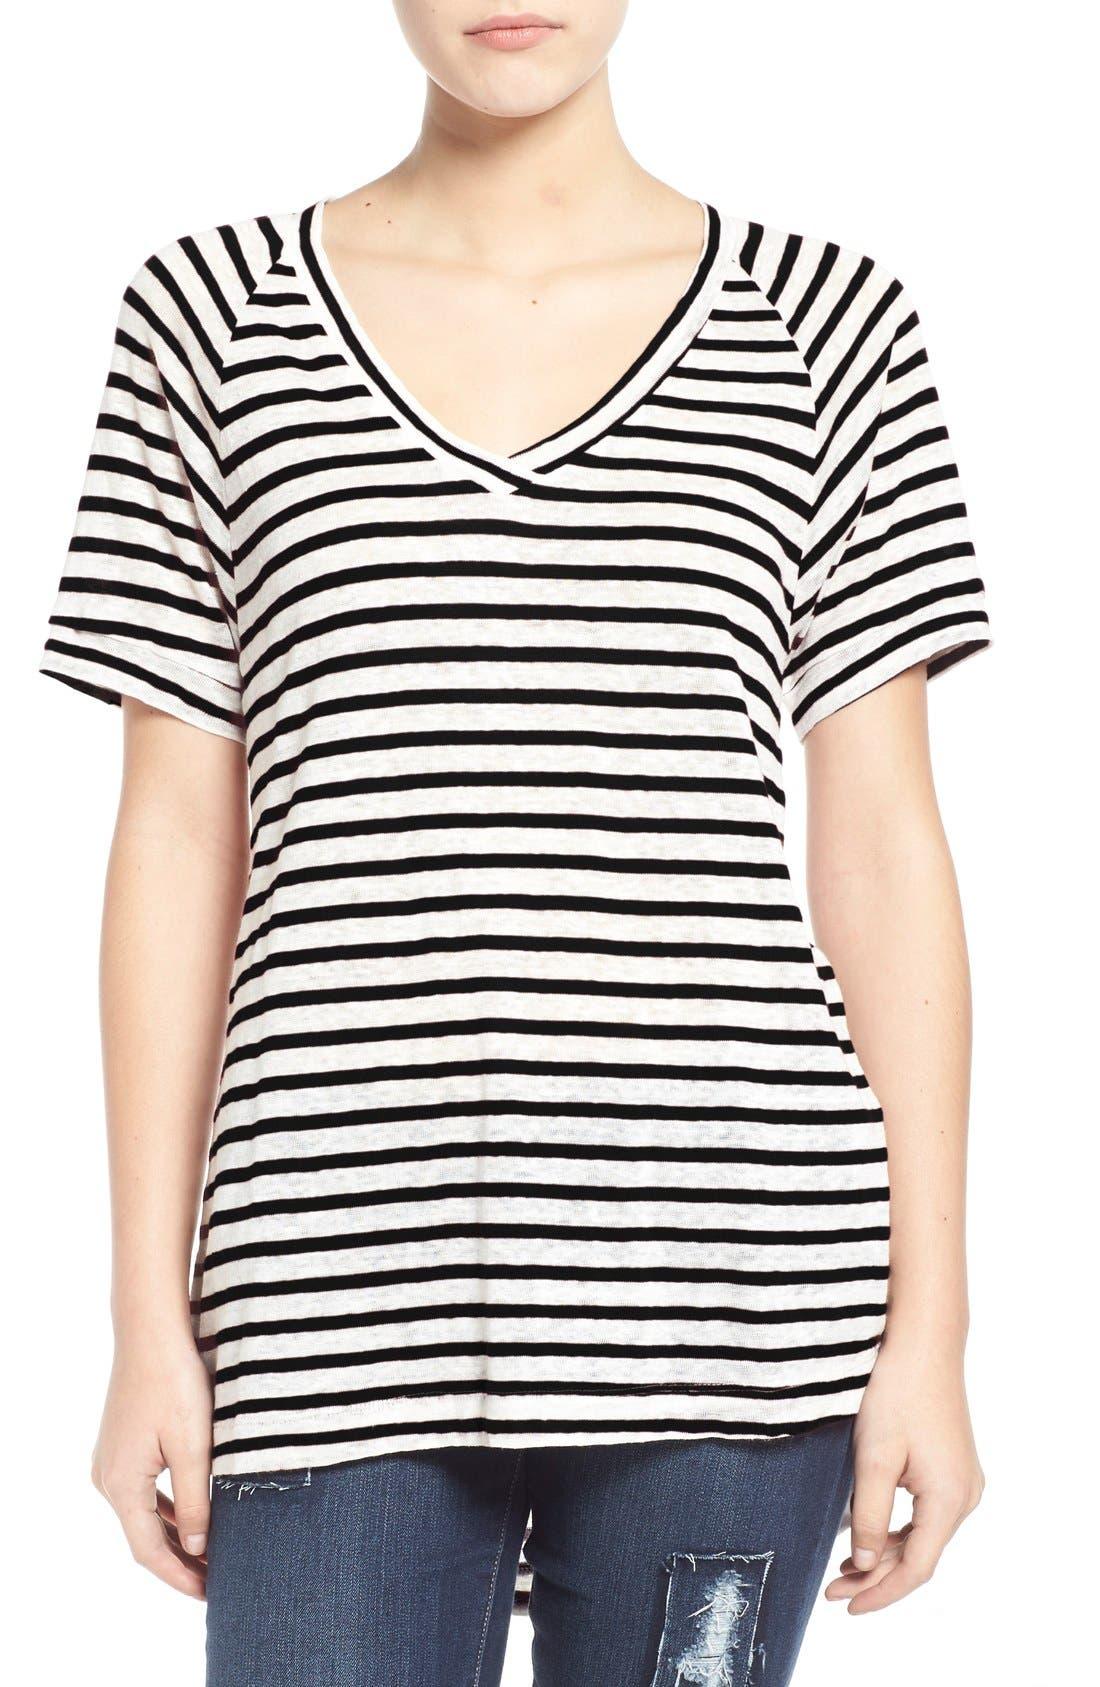 Main Image - The Hanger Stripe V-Neck High/Low Tee